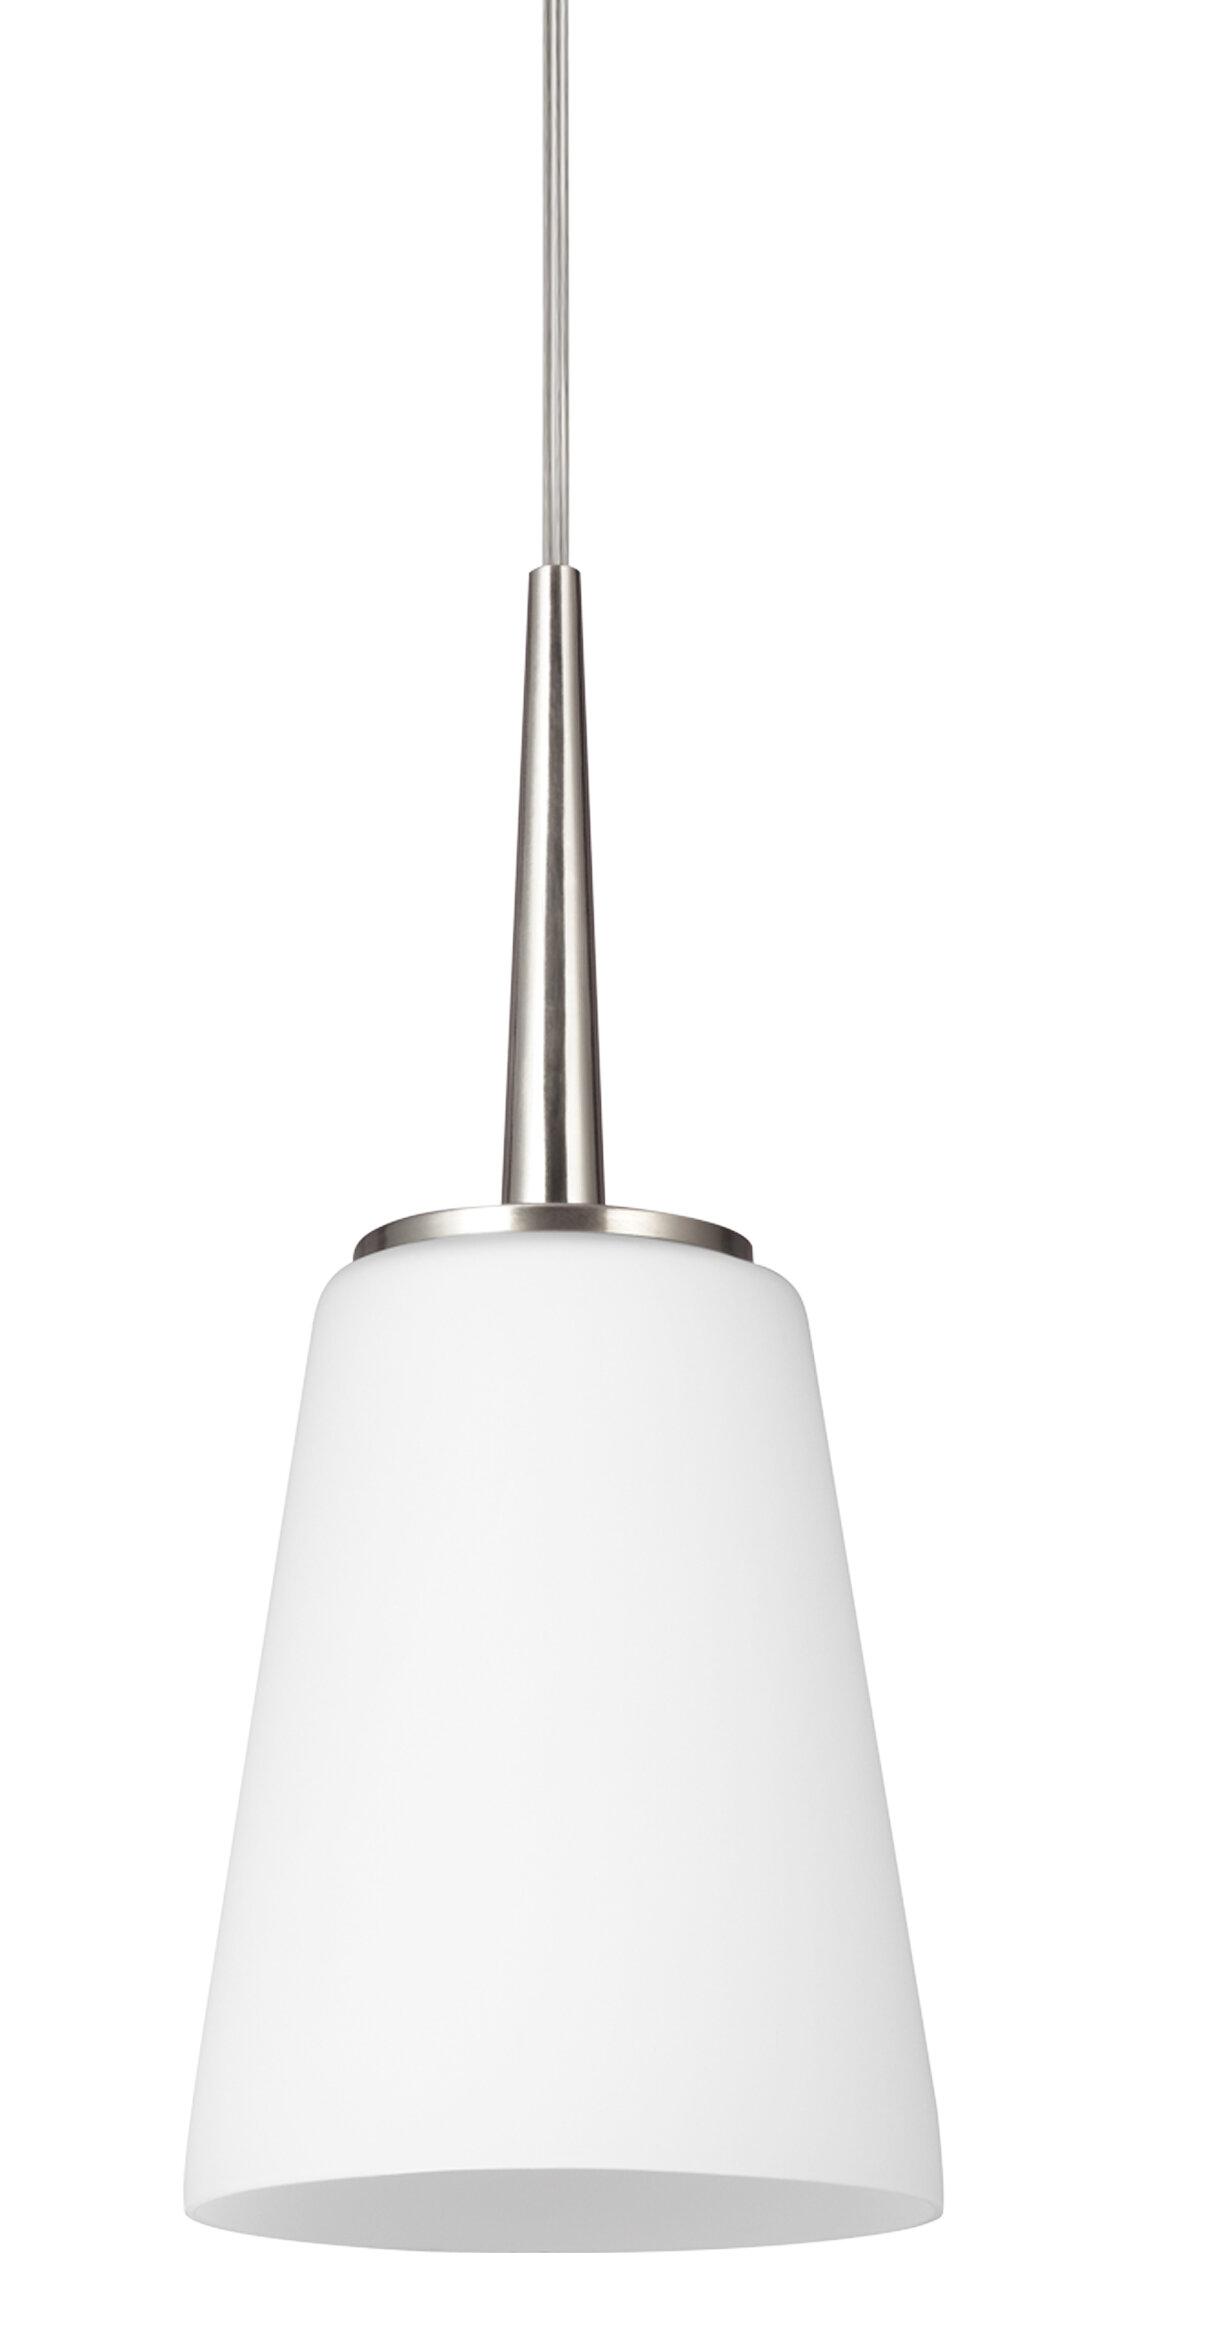 Aimee 1 Light Single Cone Pendant